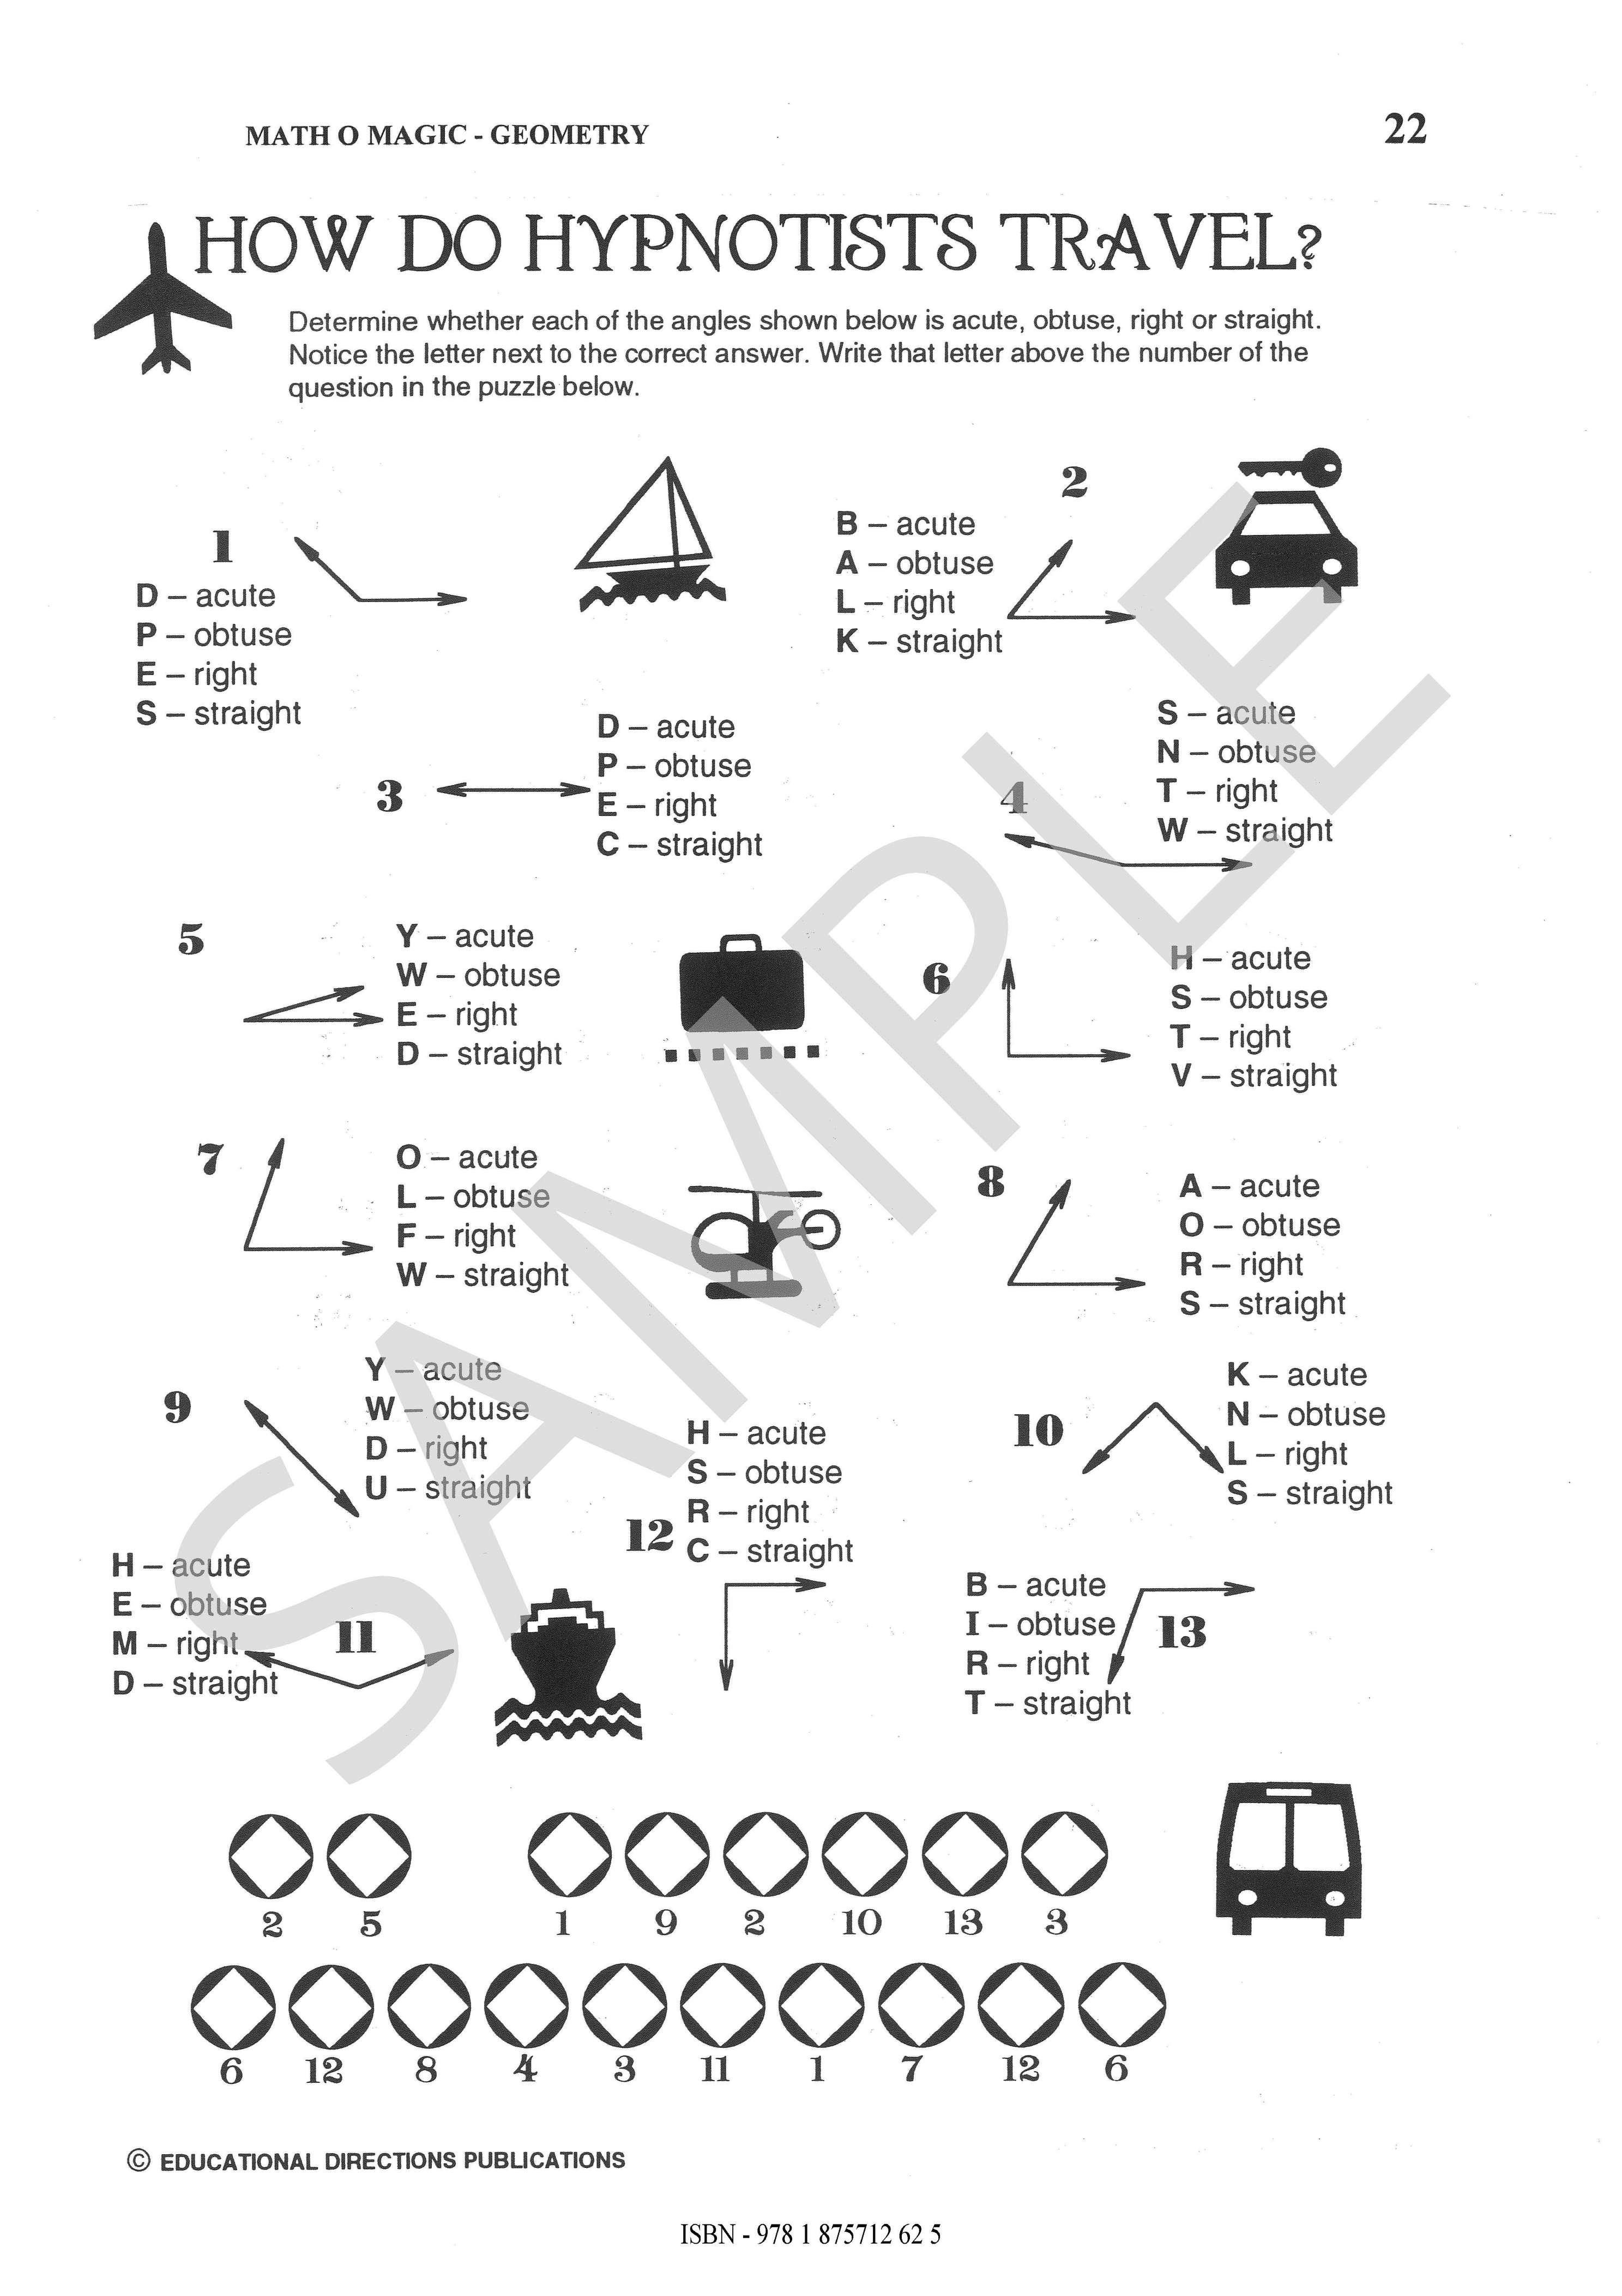 Math O Magic Geometry Ed Publications